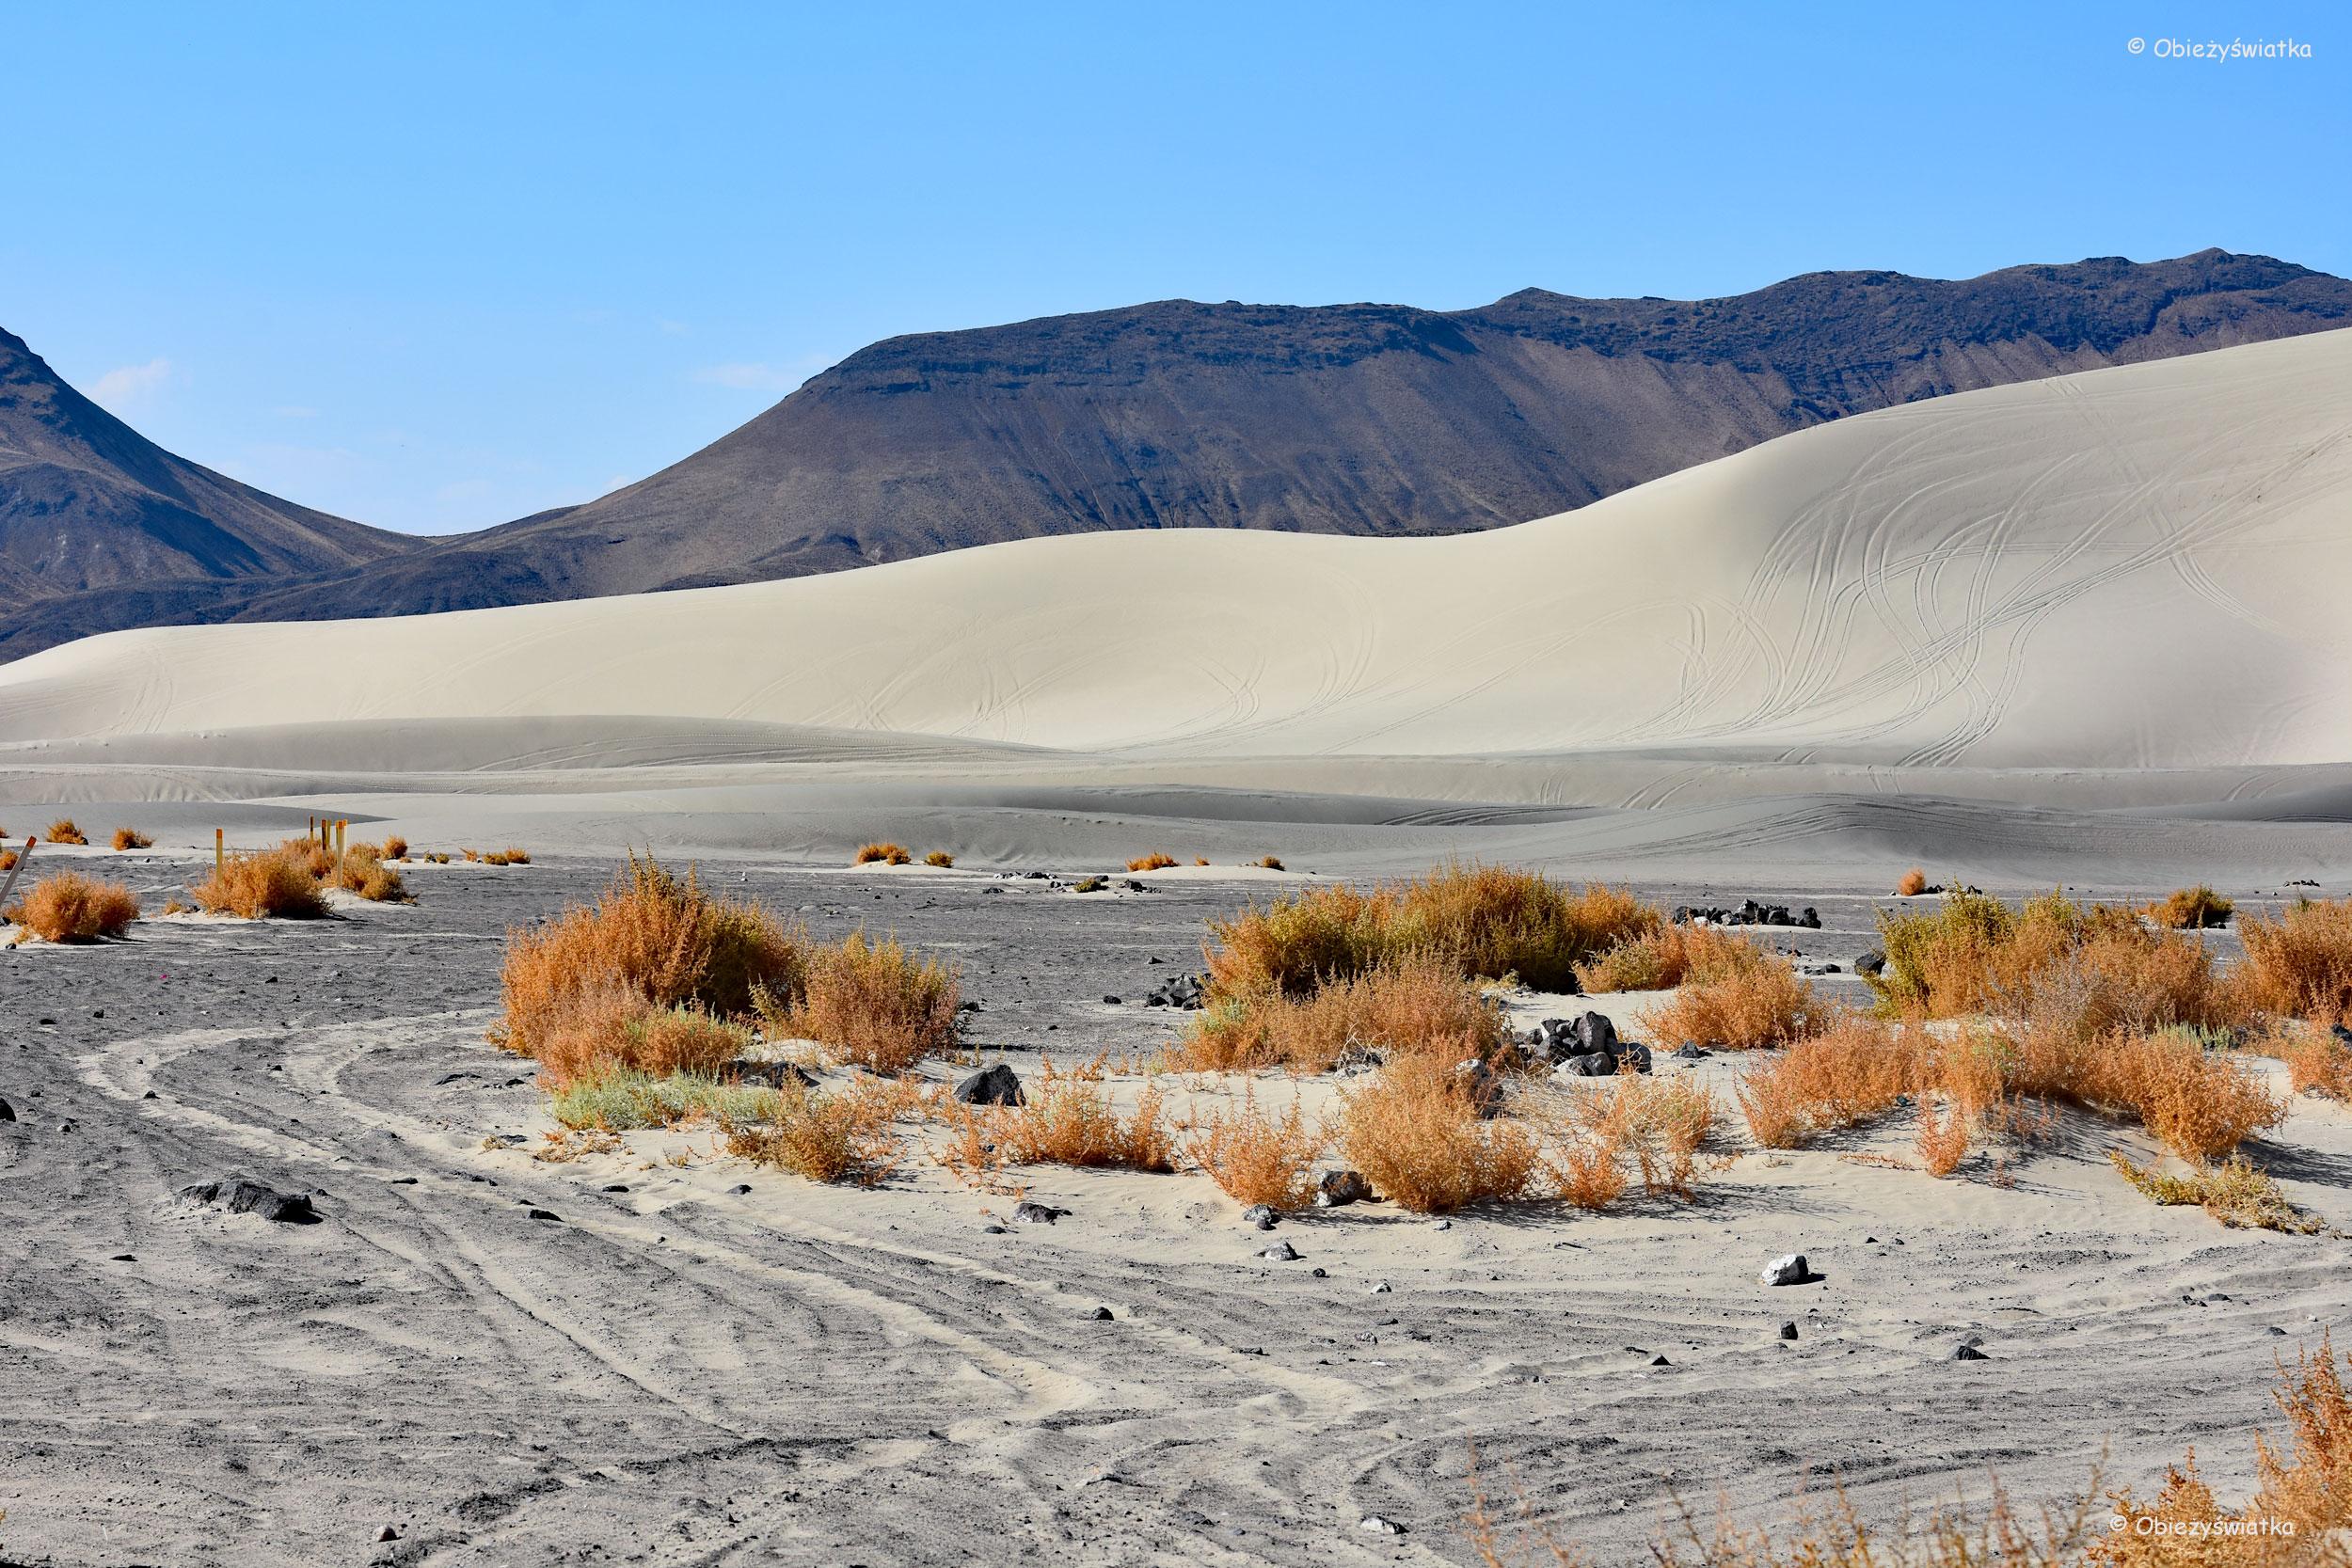 Piasek, piasek... - Wydmy / Sand Mountain, Nevada